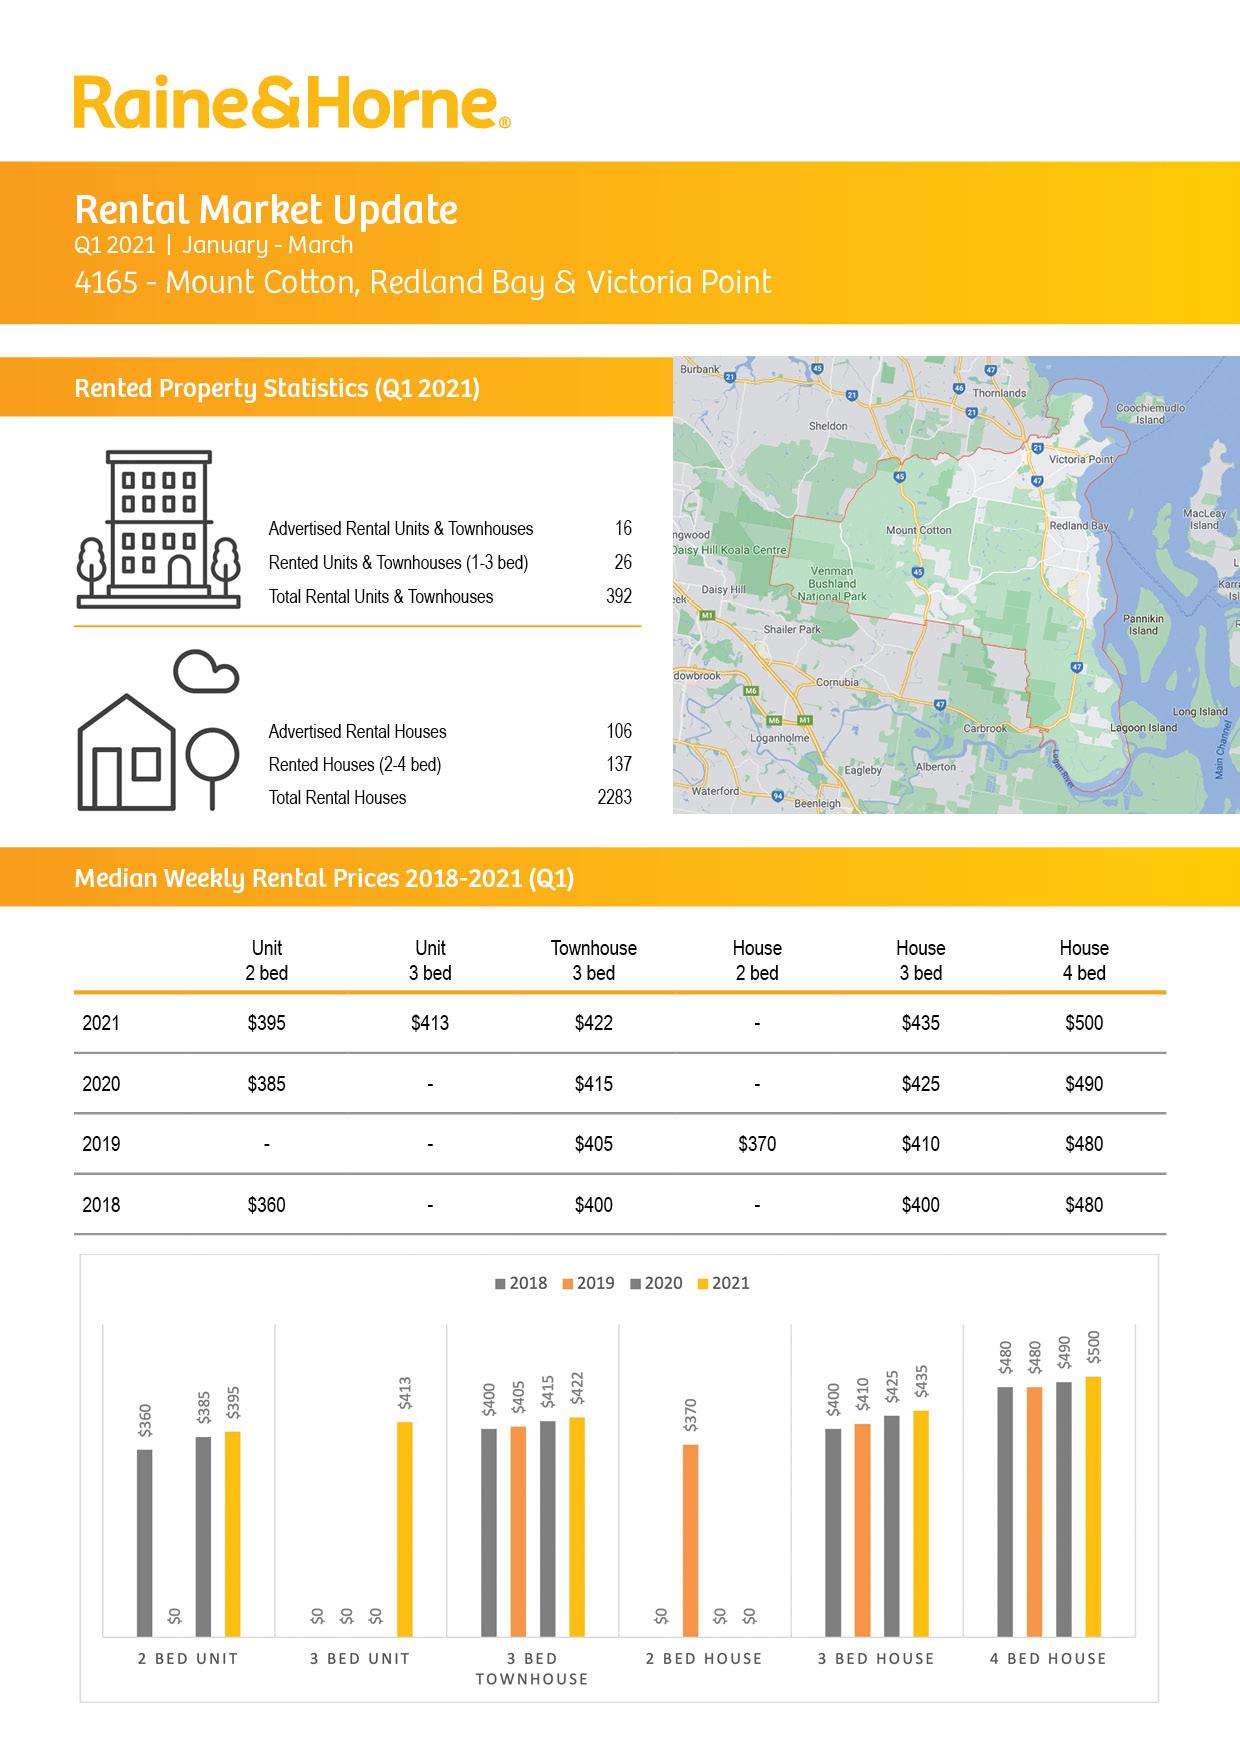 4165 Rental Market Update